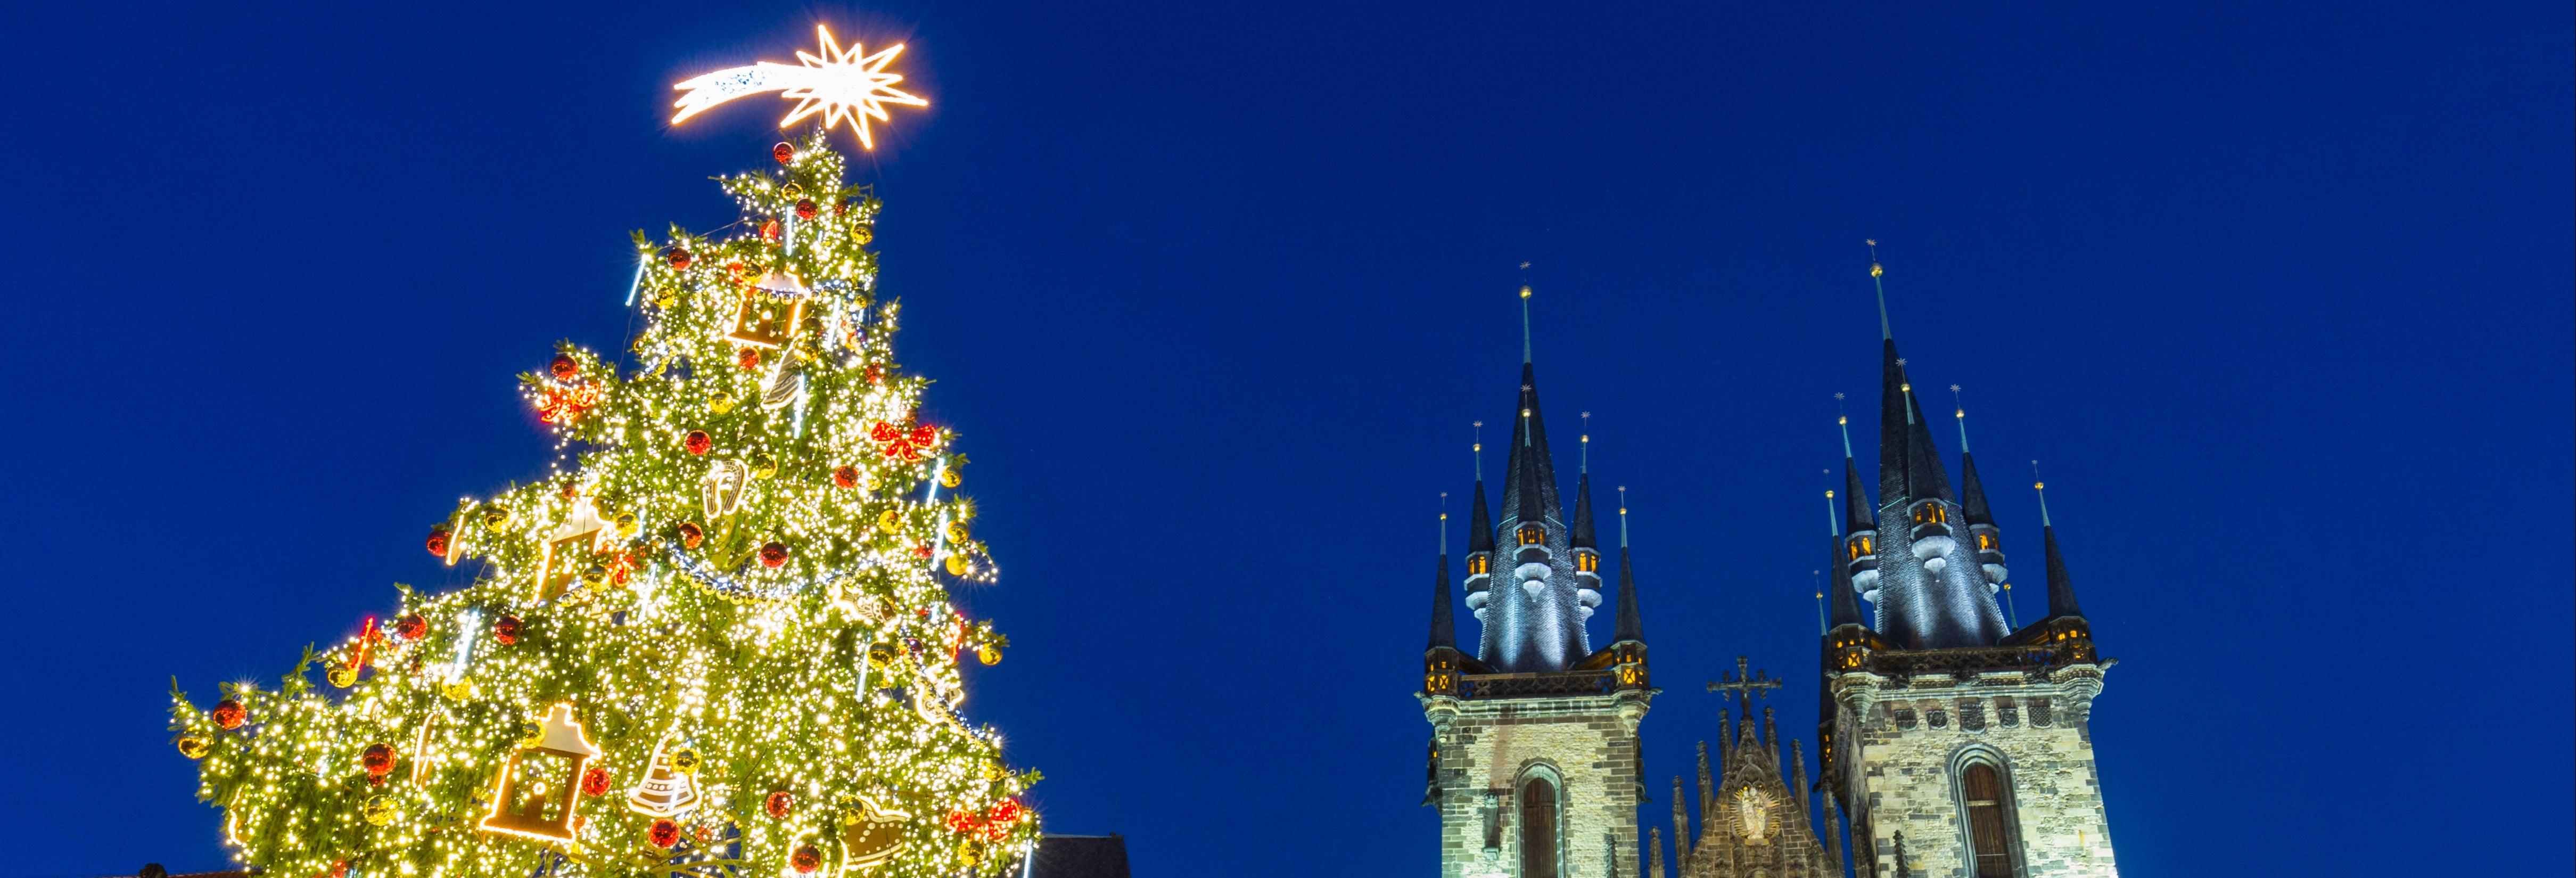 Tour navideño por Praga